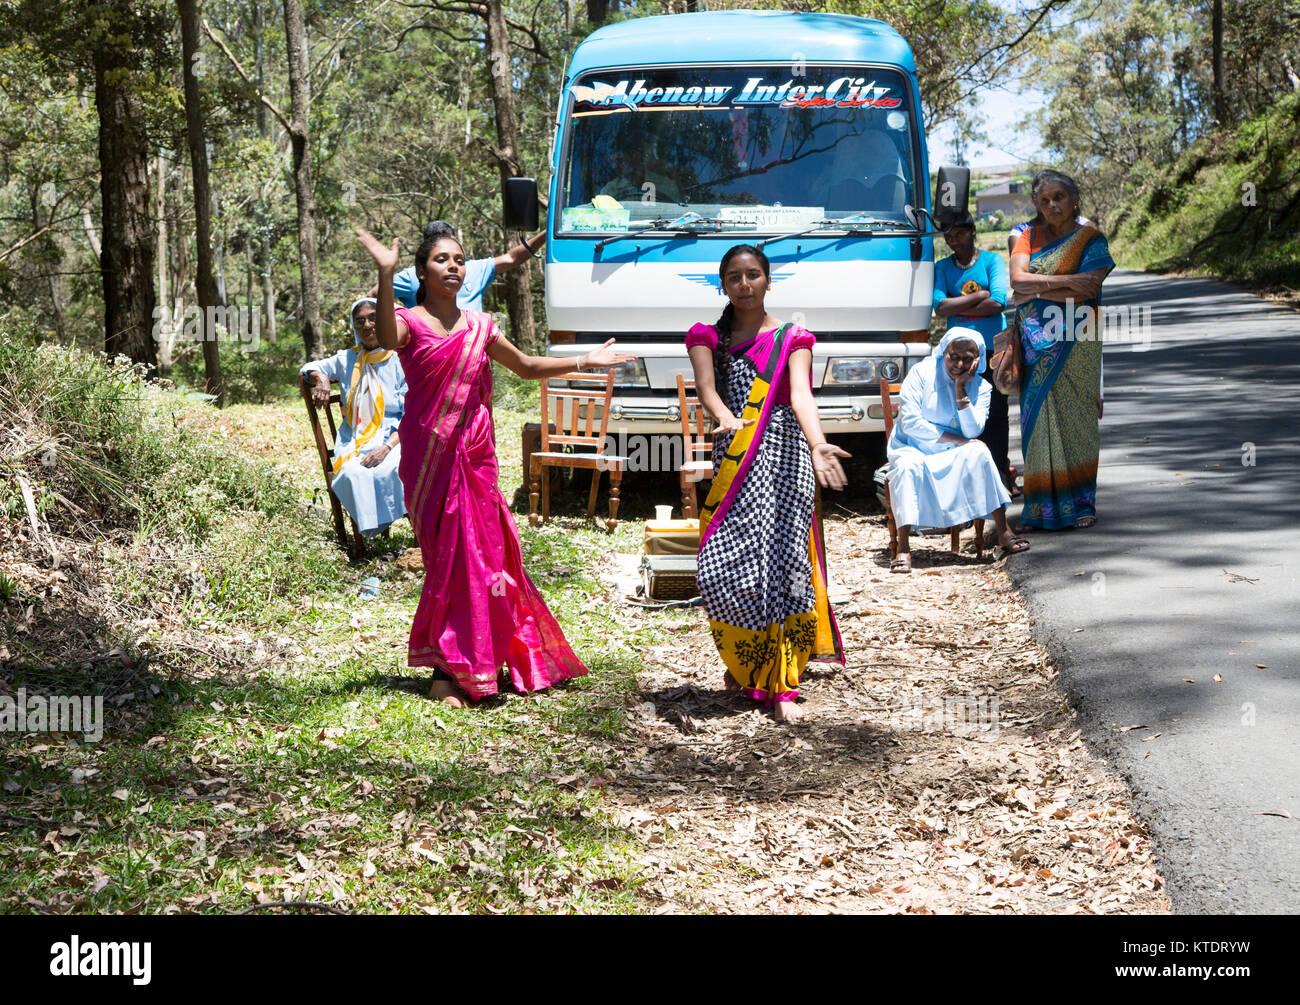 traditional dancing in sri lanka Kandy, photo of men dancing traditional kandyan dance at a tourist show at the kandy arts assication hall, sri lanka, asia this is a photo of a men dancing traditional kandyan dance at a tourist show at the kandy arts assication hall, sri lanka, asia.